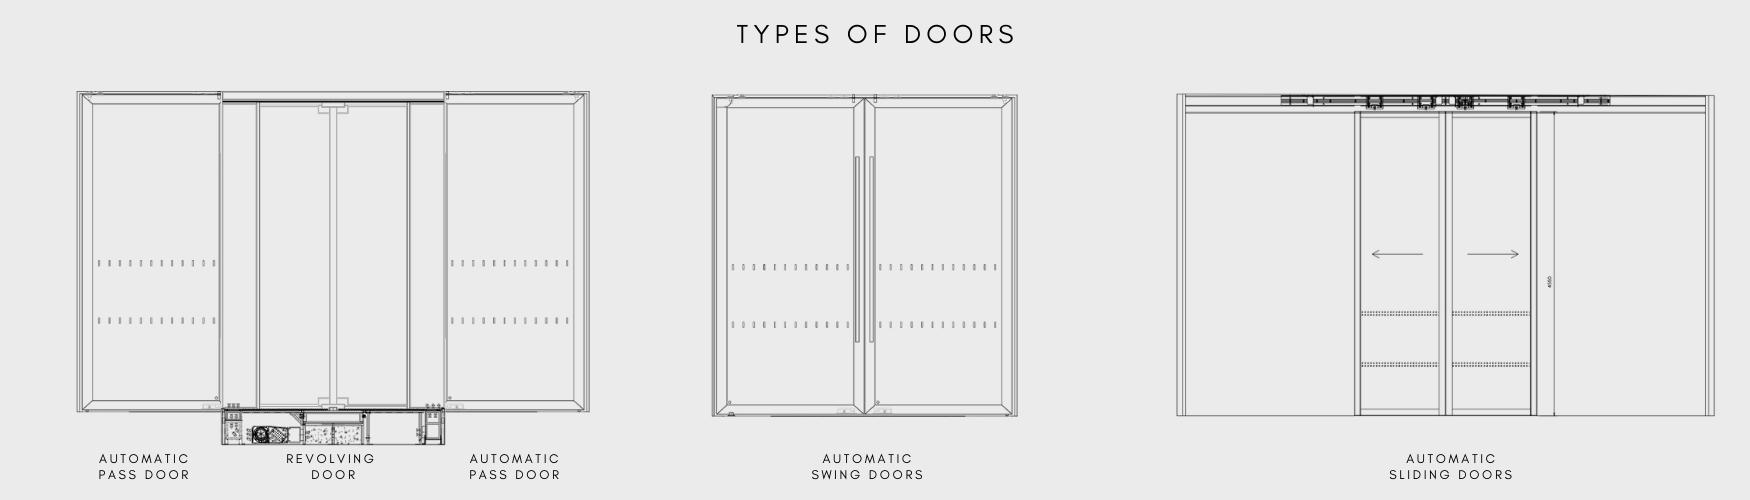 types of doors - automatic pass doors - revolving doors - swing doors - sliding doors